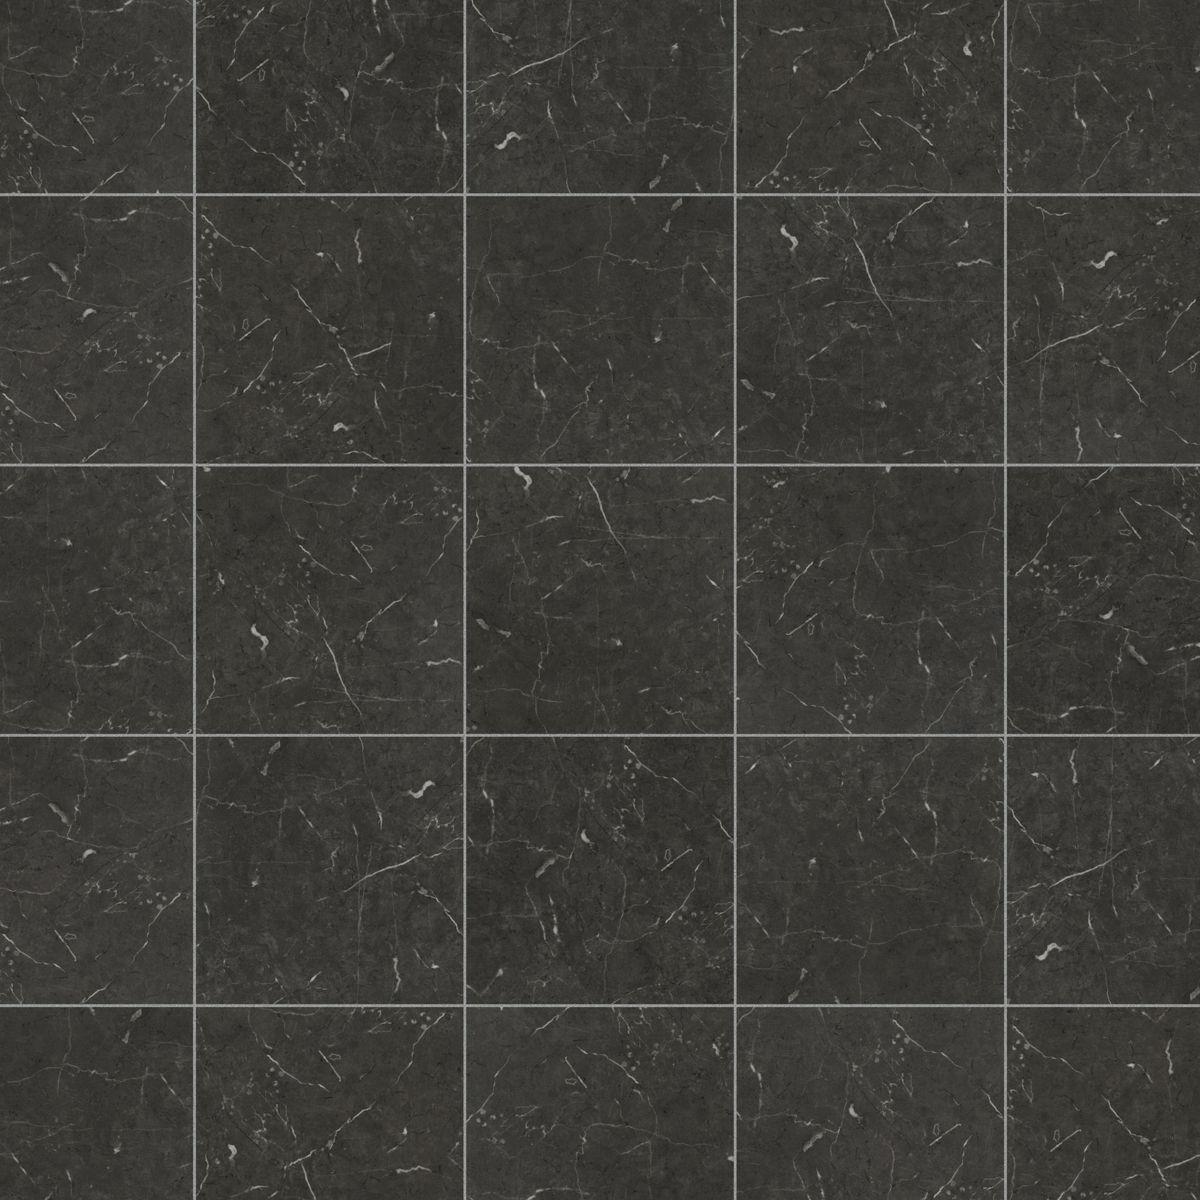 Karndean Knight Tile Midnight Black T74 Vinyl Flooring Interiors Inside Ideas Interiors design about Everything [magnanprojects.com]